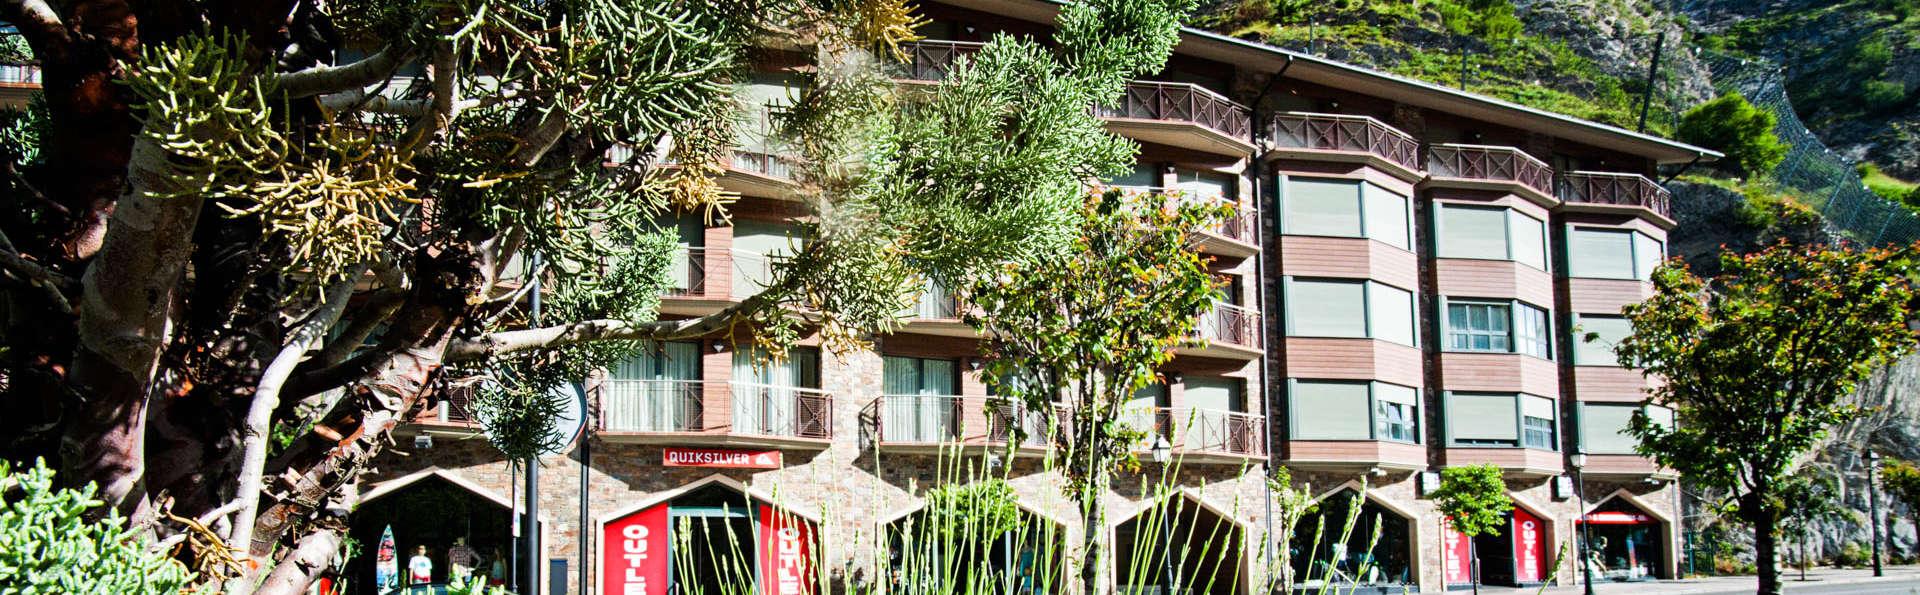 Andorra4Days Canillo - EDIT_FRONT-2.jpg